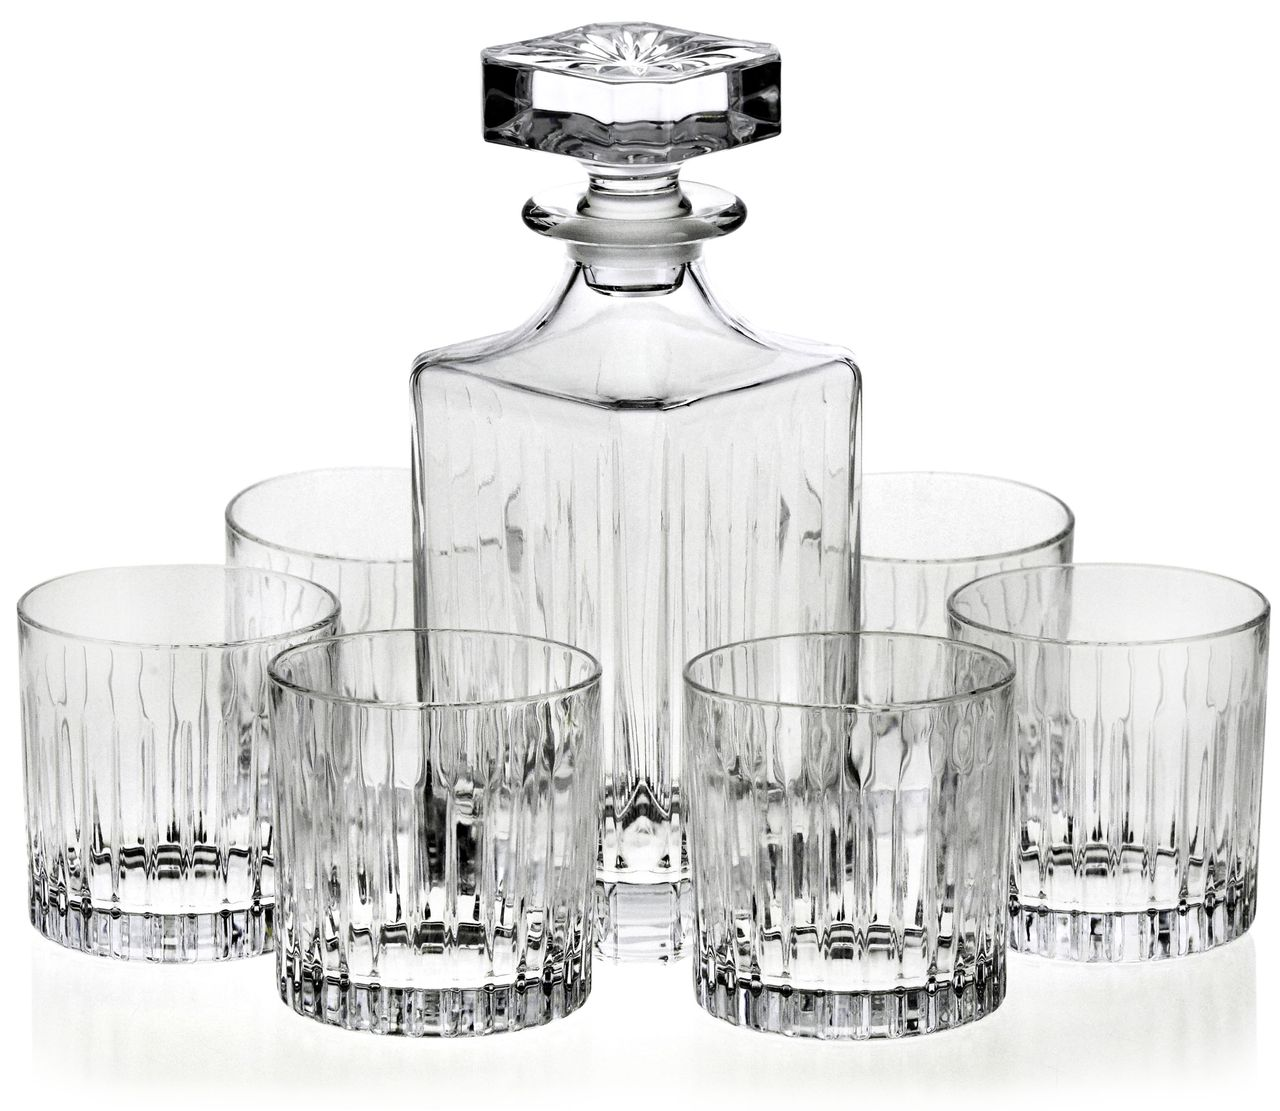 Zestaw karafka szklanki do whisky RCR TIMELESS 6+1